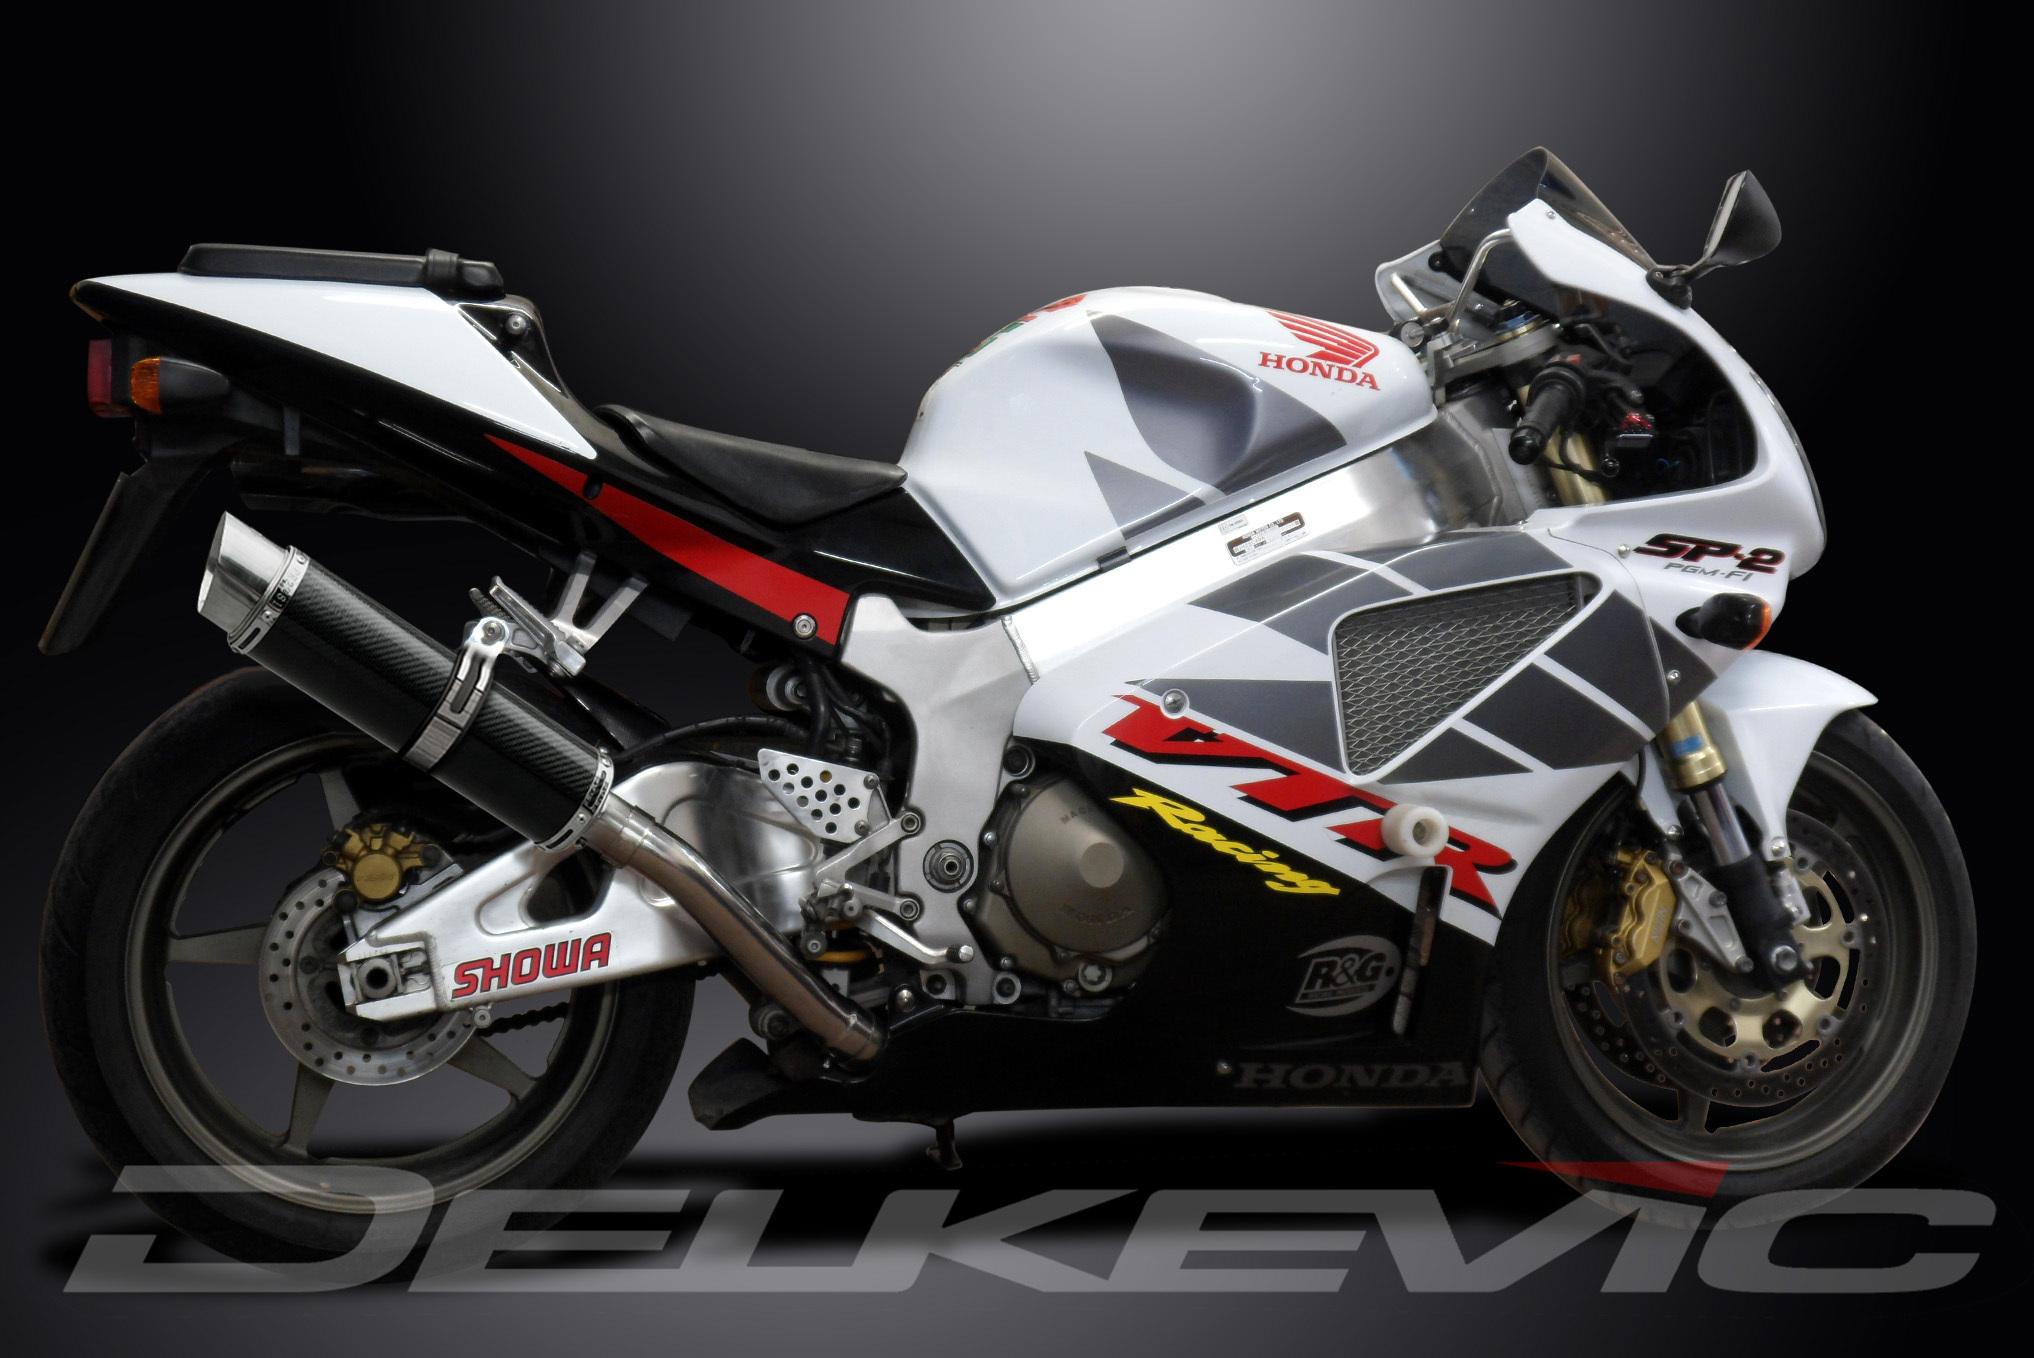 RVT1000R RC51